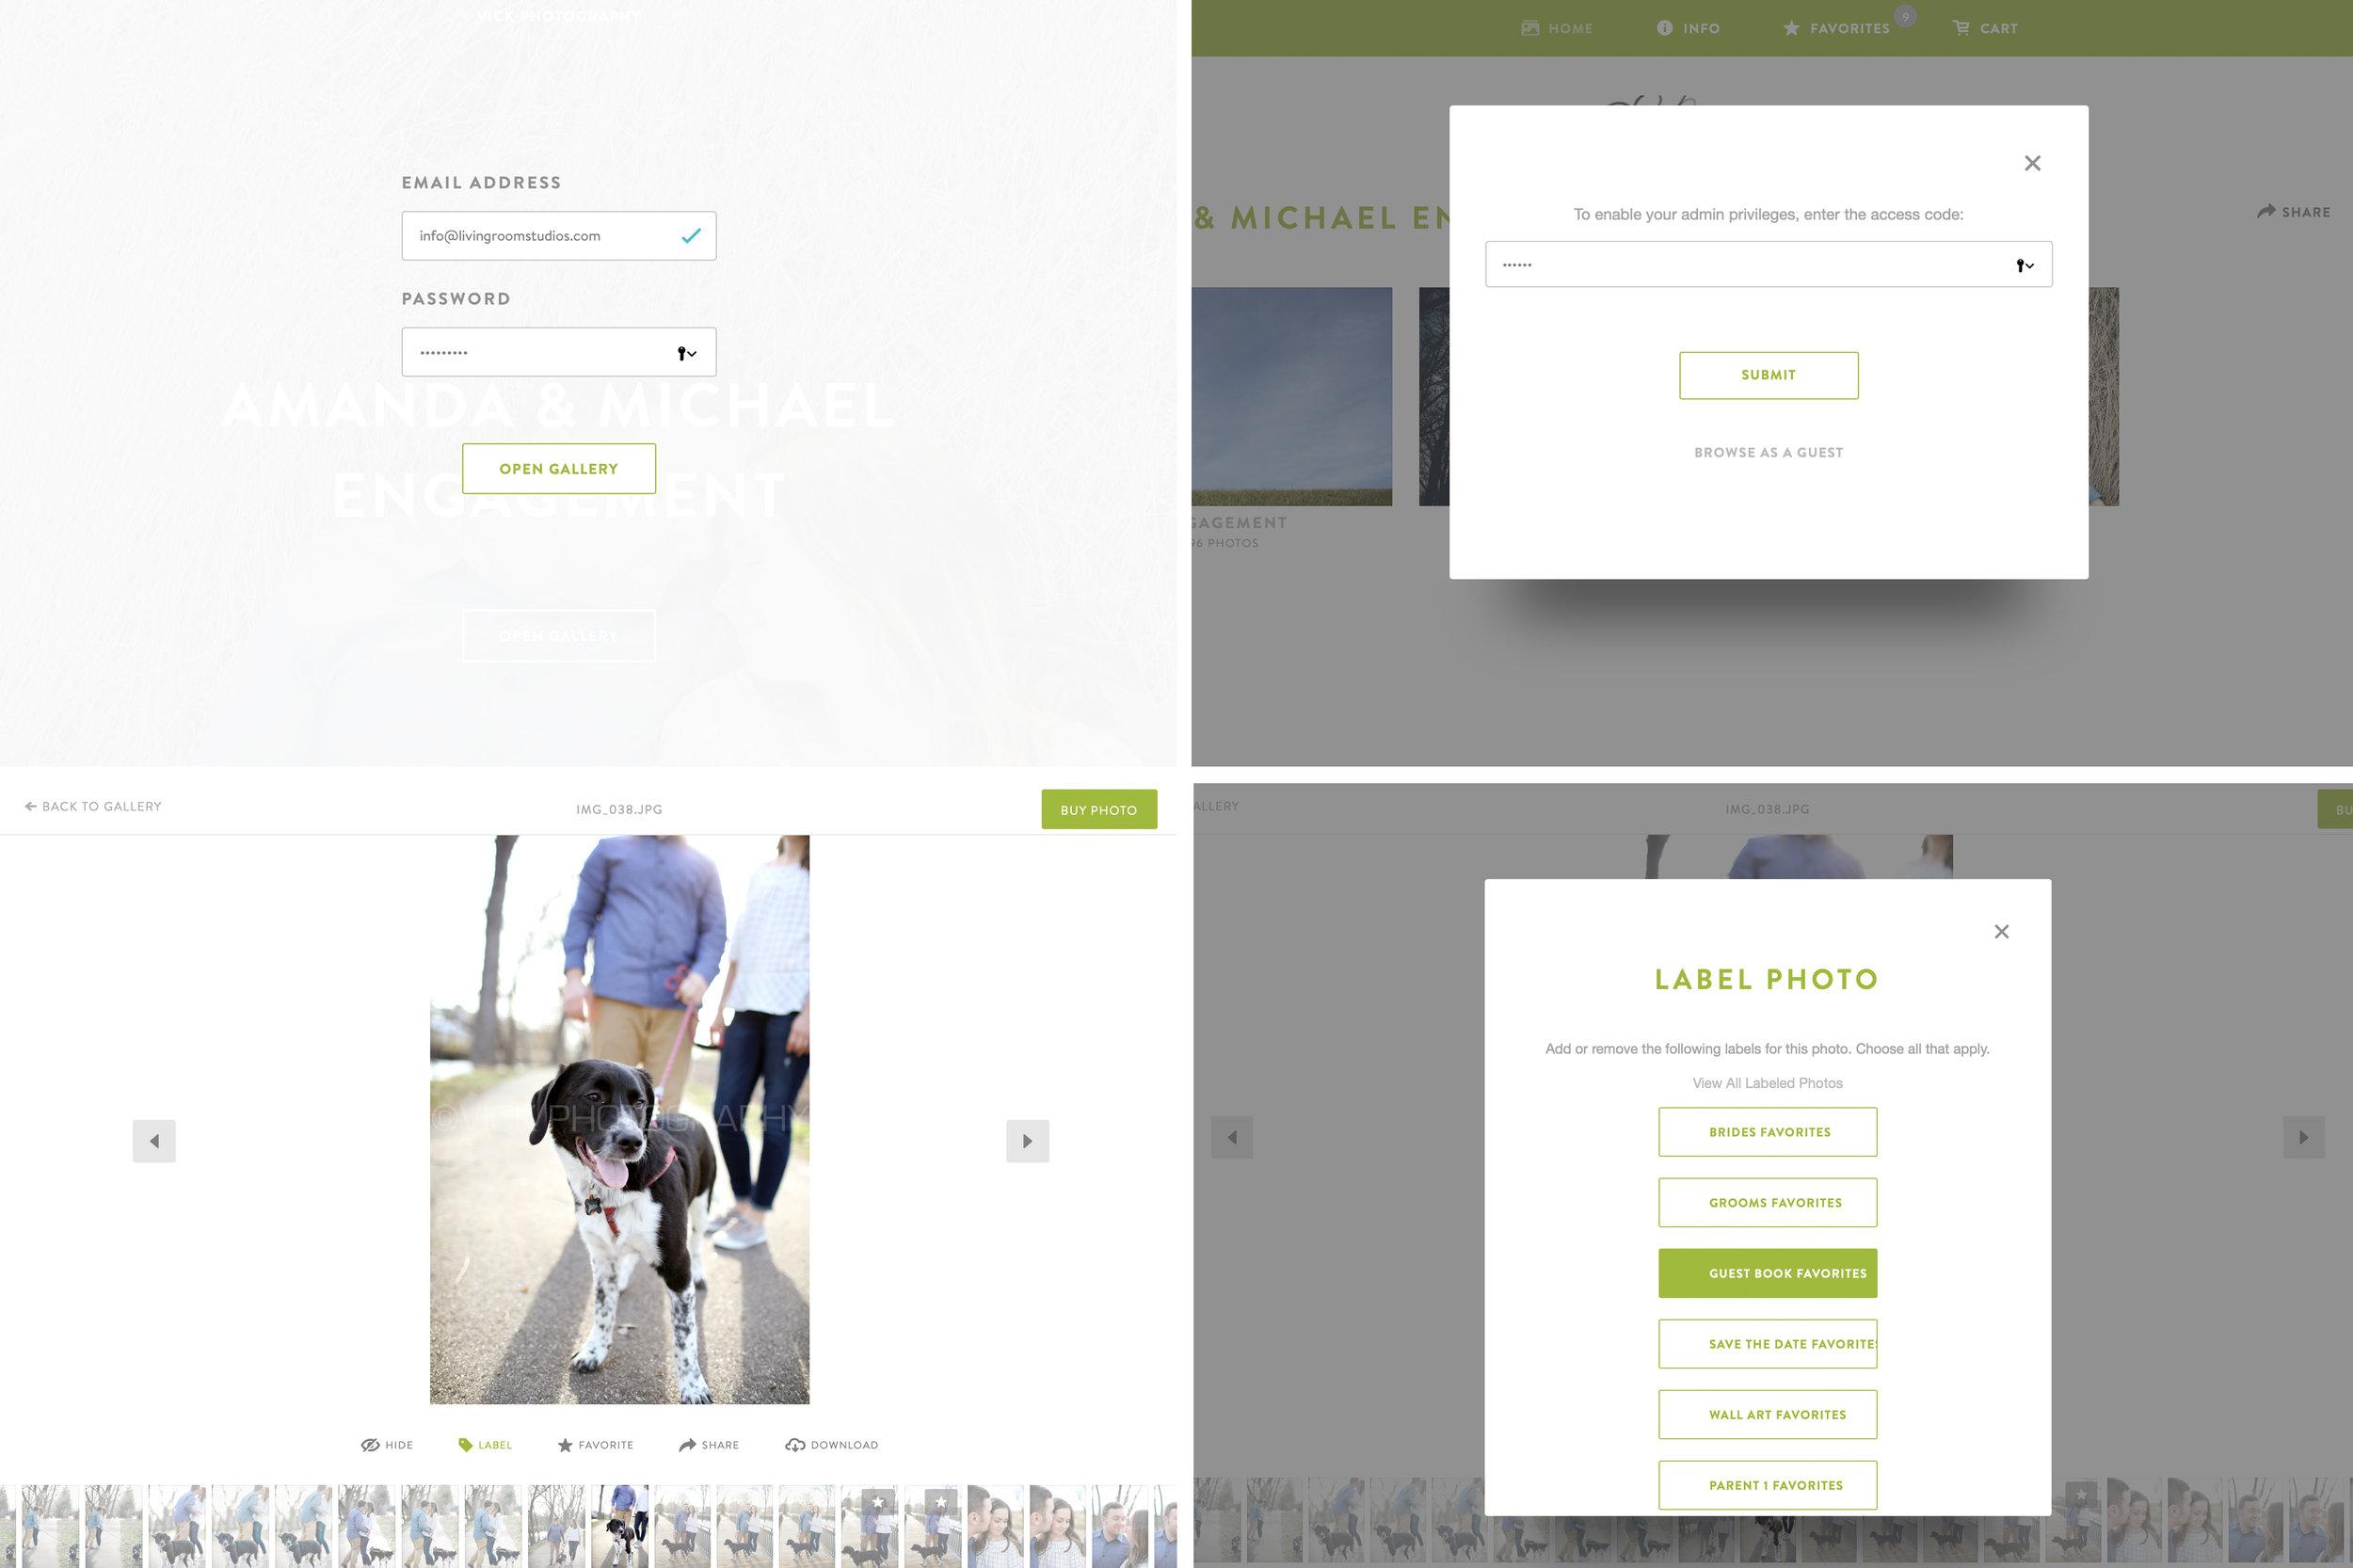 Labeling Photos.jpg